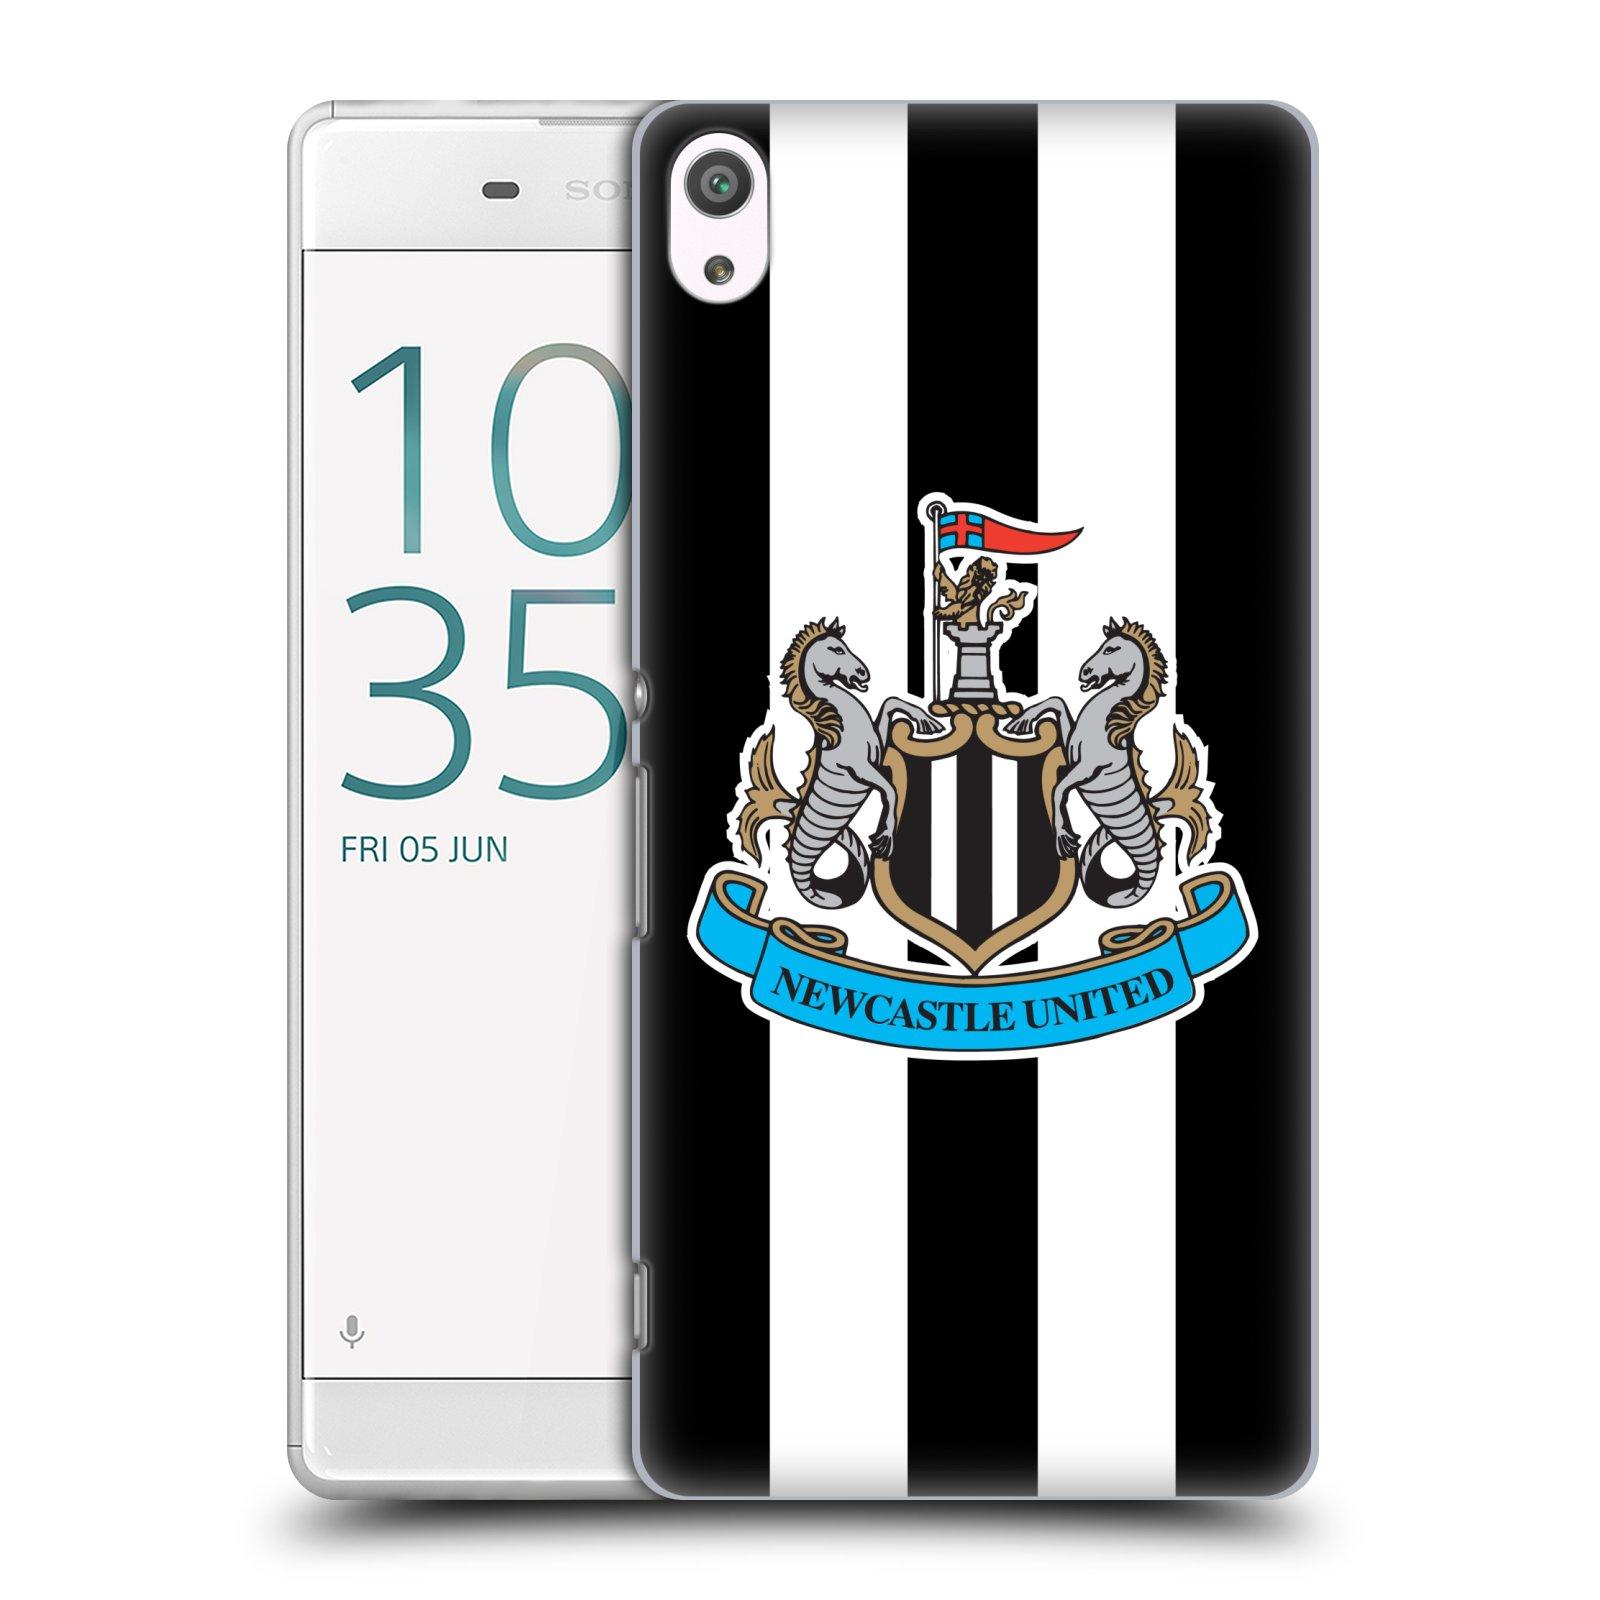 Plastové pouzdro na mobil Sony Xperia XA Ultra HEAD CASE Newcastle United FC - Pruhy